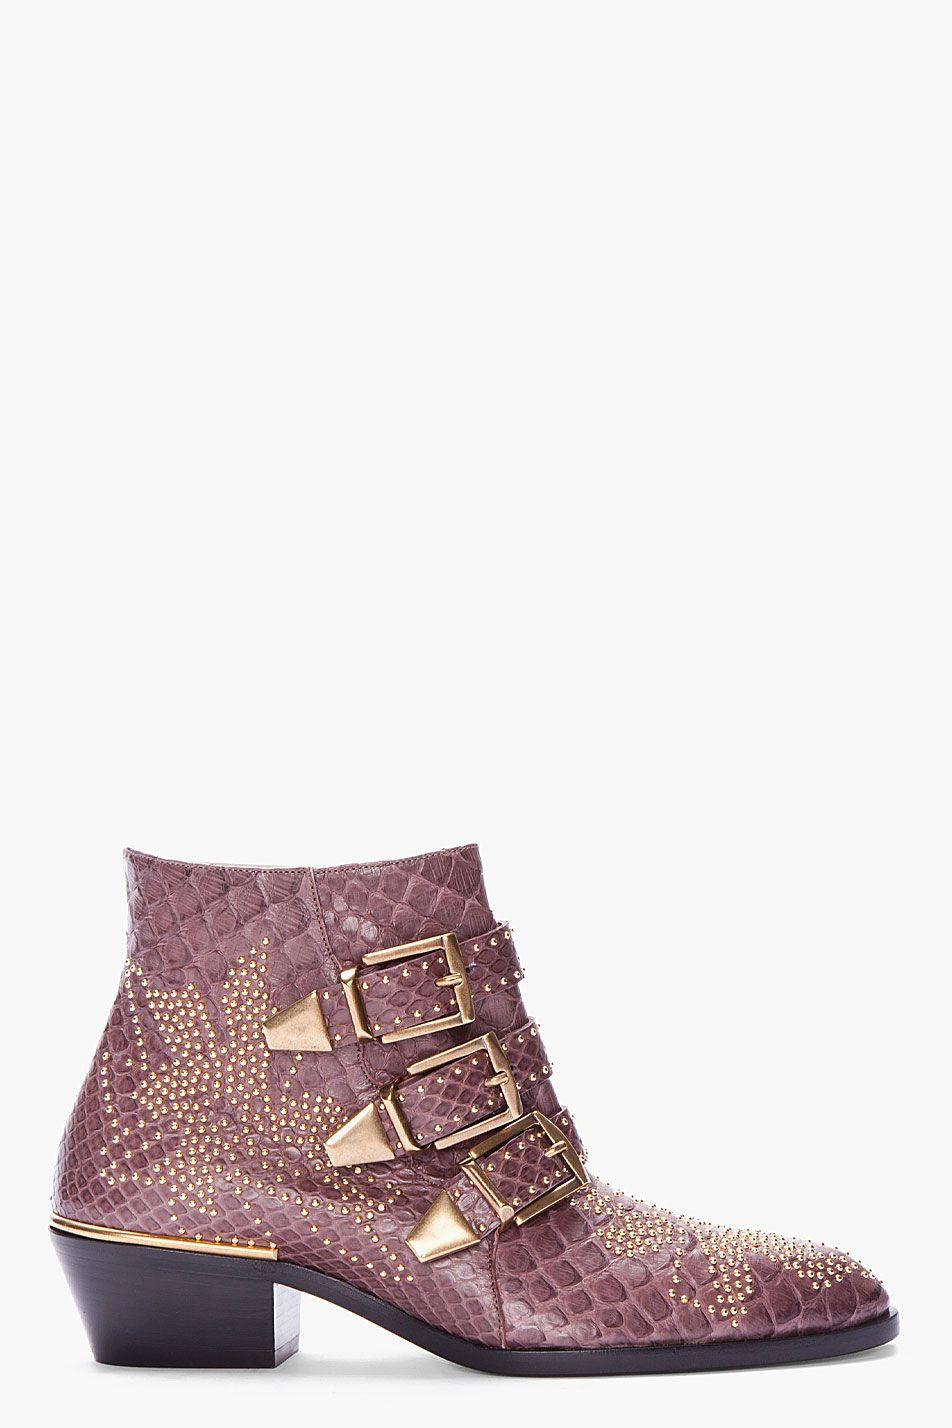 Chloé Susanna Python Leather Ankle Boots 13EzXSmcO